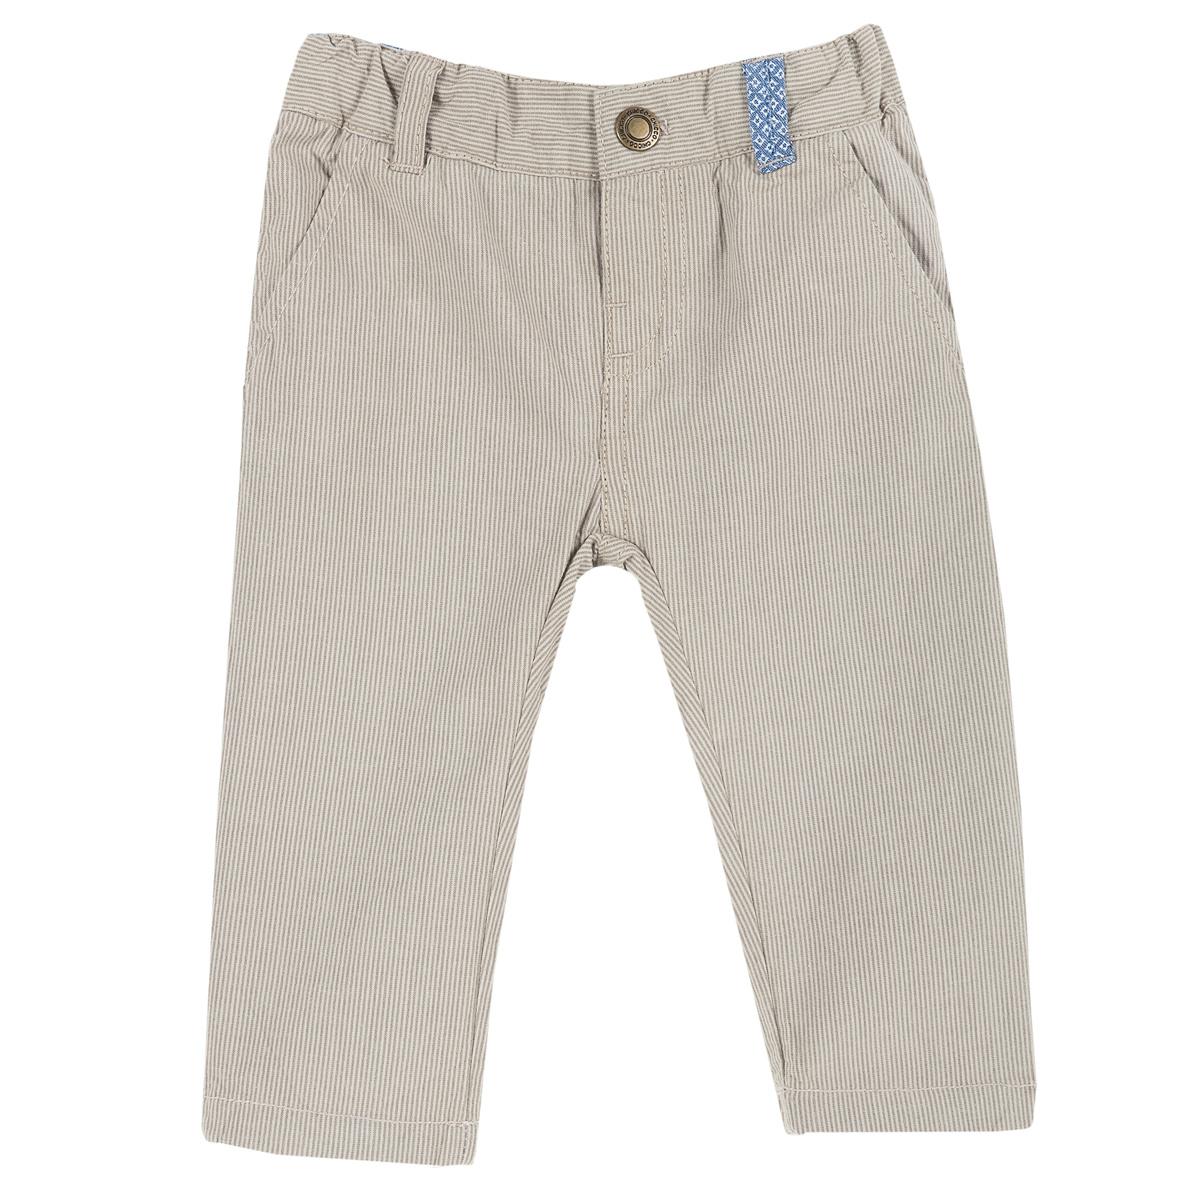 Chicco Pantalon lung copii Chicco maro 104